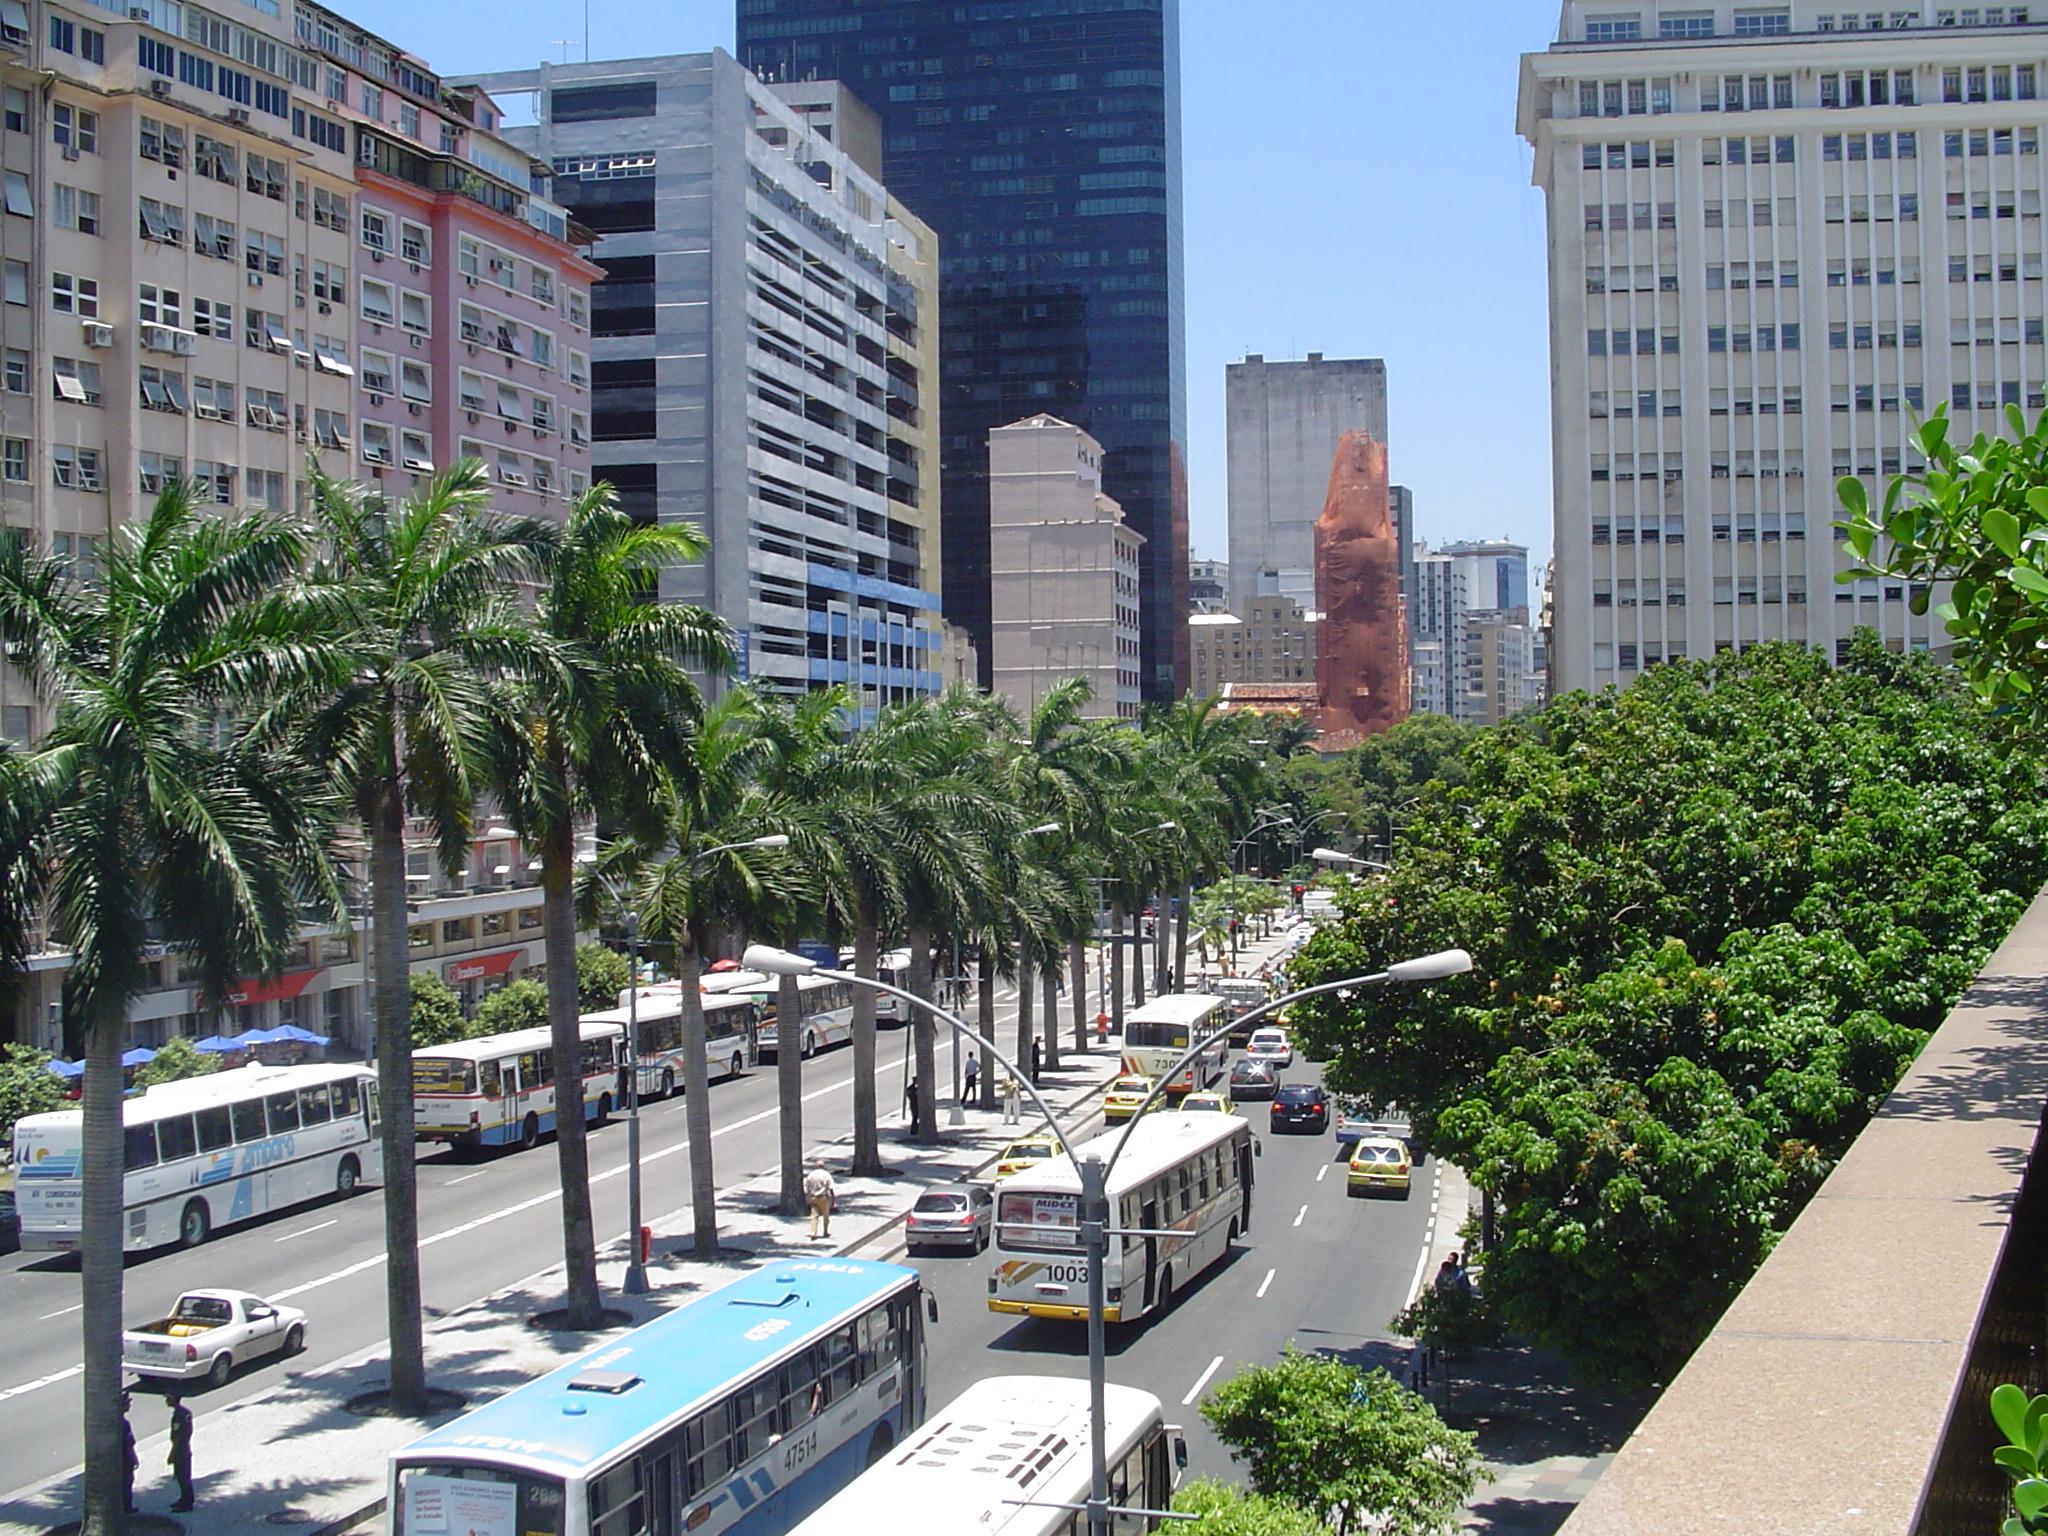 http://upload.wikimedia.org/wikipedia/commons/b/bf/Avenida_rio_de_janeiro.jpg